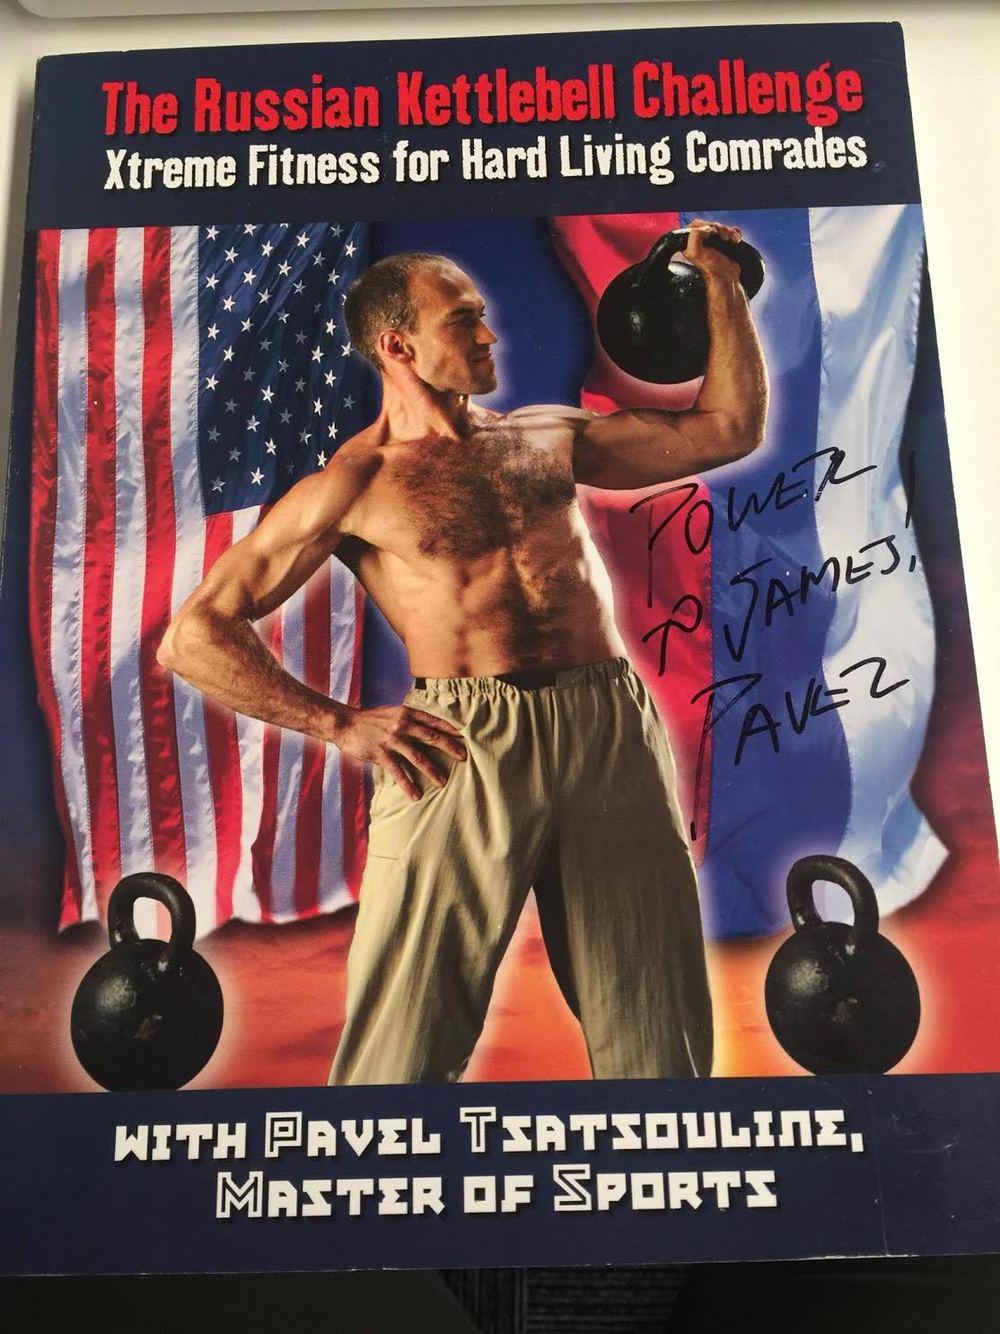 Kettlebell Challenge - Pavel